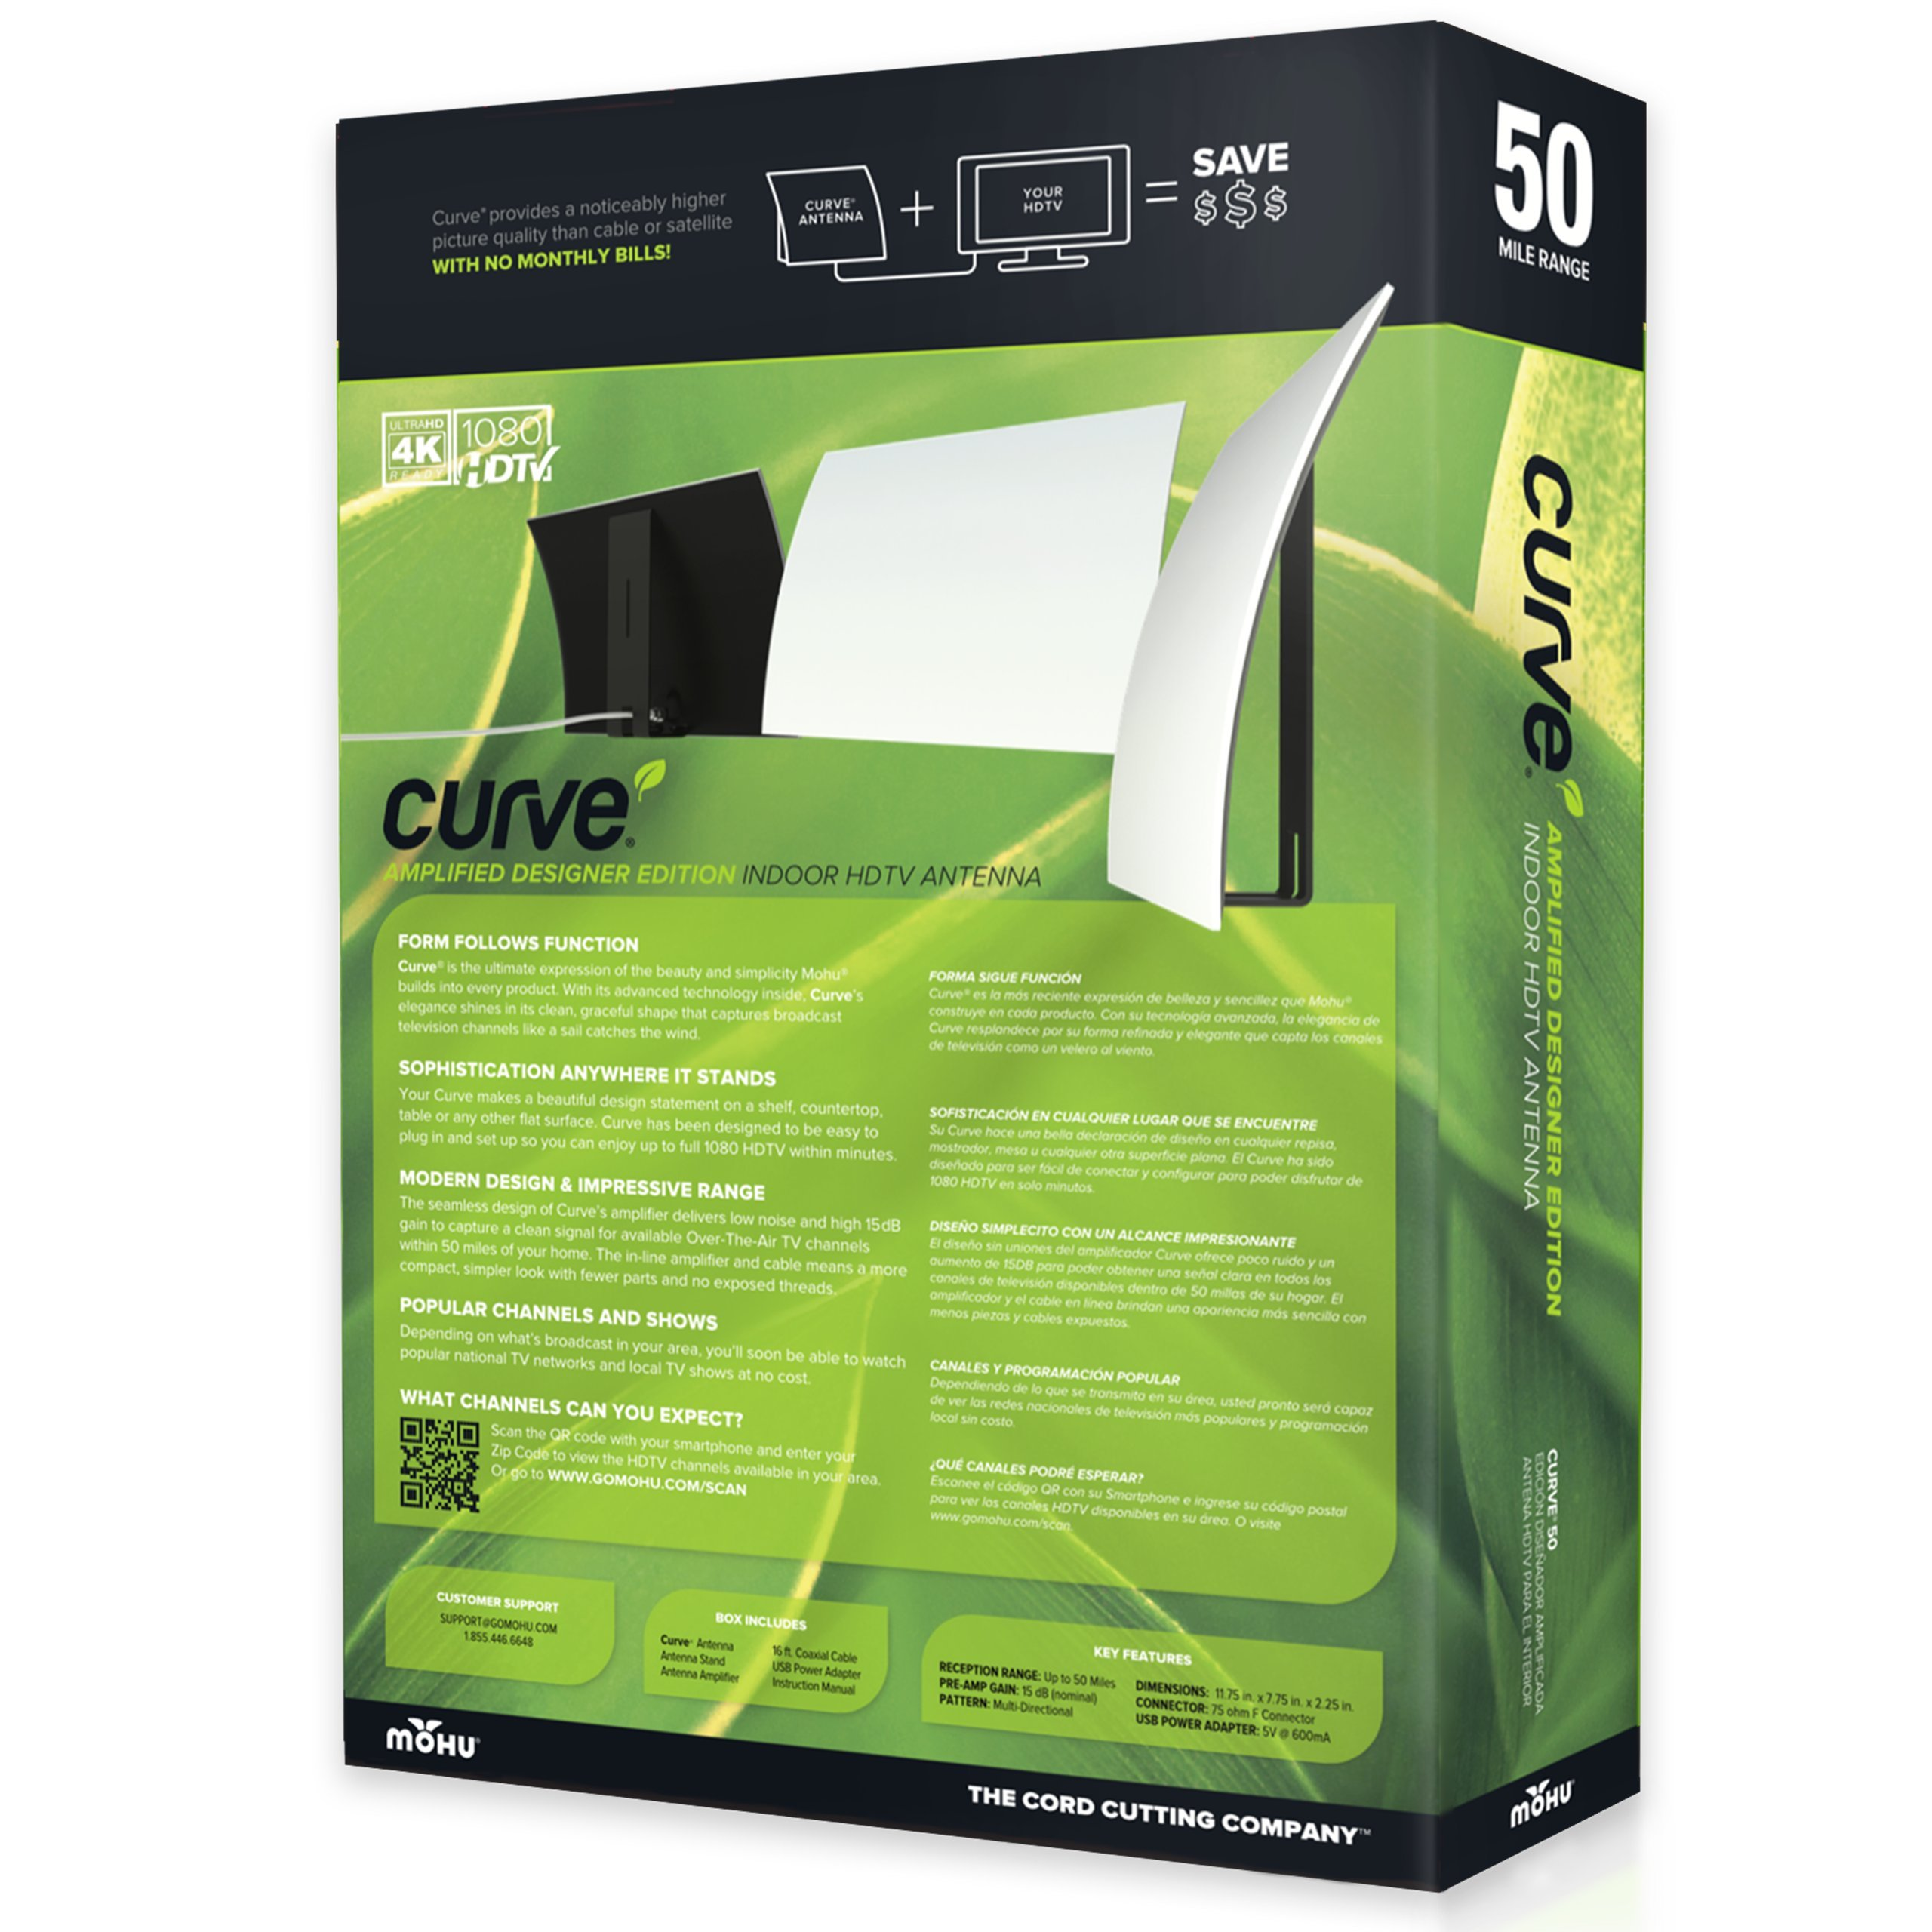 Mohu Curve 50 TV Antenna Indoor Amplified 50 Mile Range Modern Design 4K-Ready HDTV Premium Materials for Performance